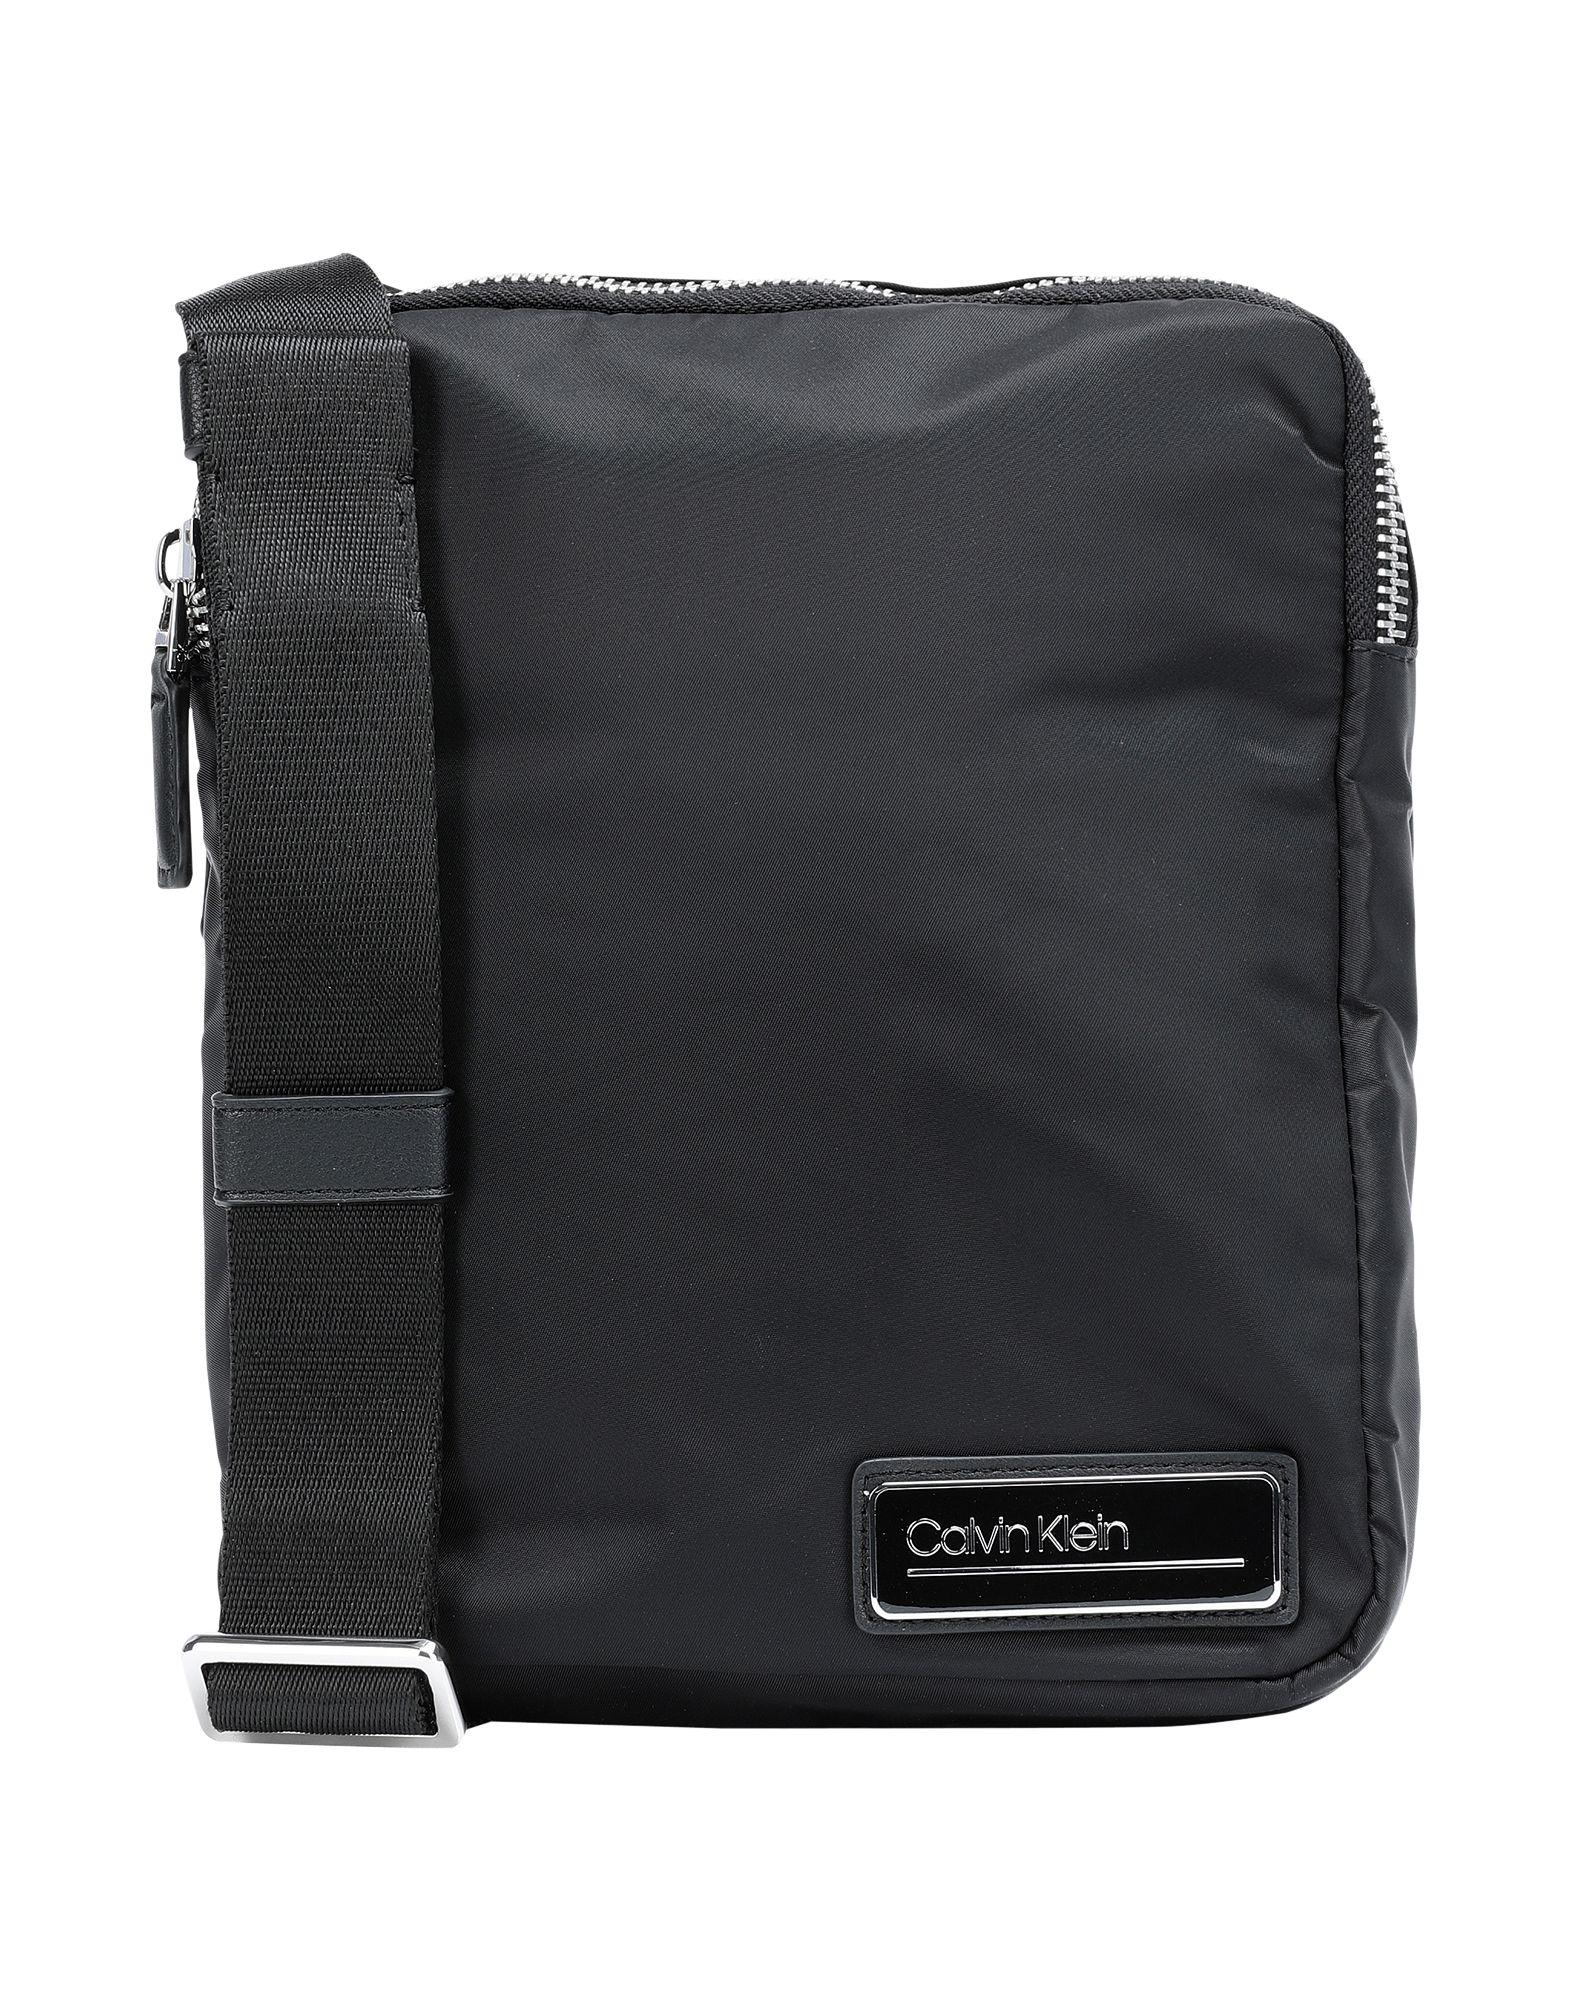 7ef75b716326 ipad ショルダーバッグ - 価格.com